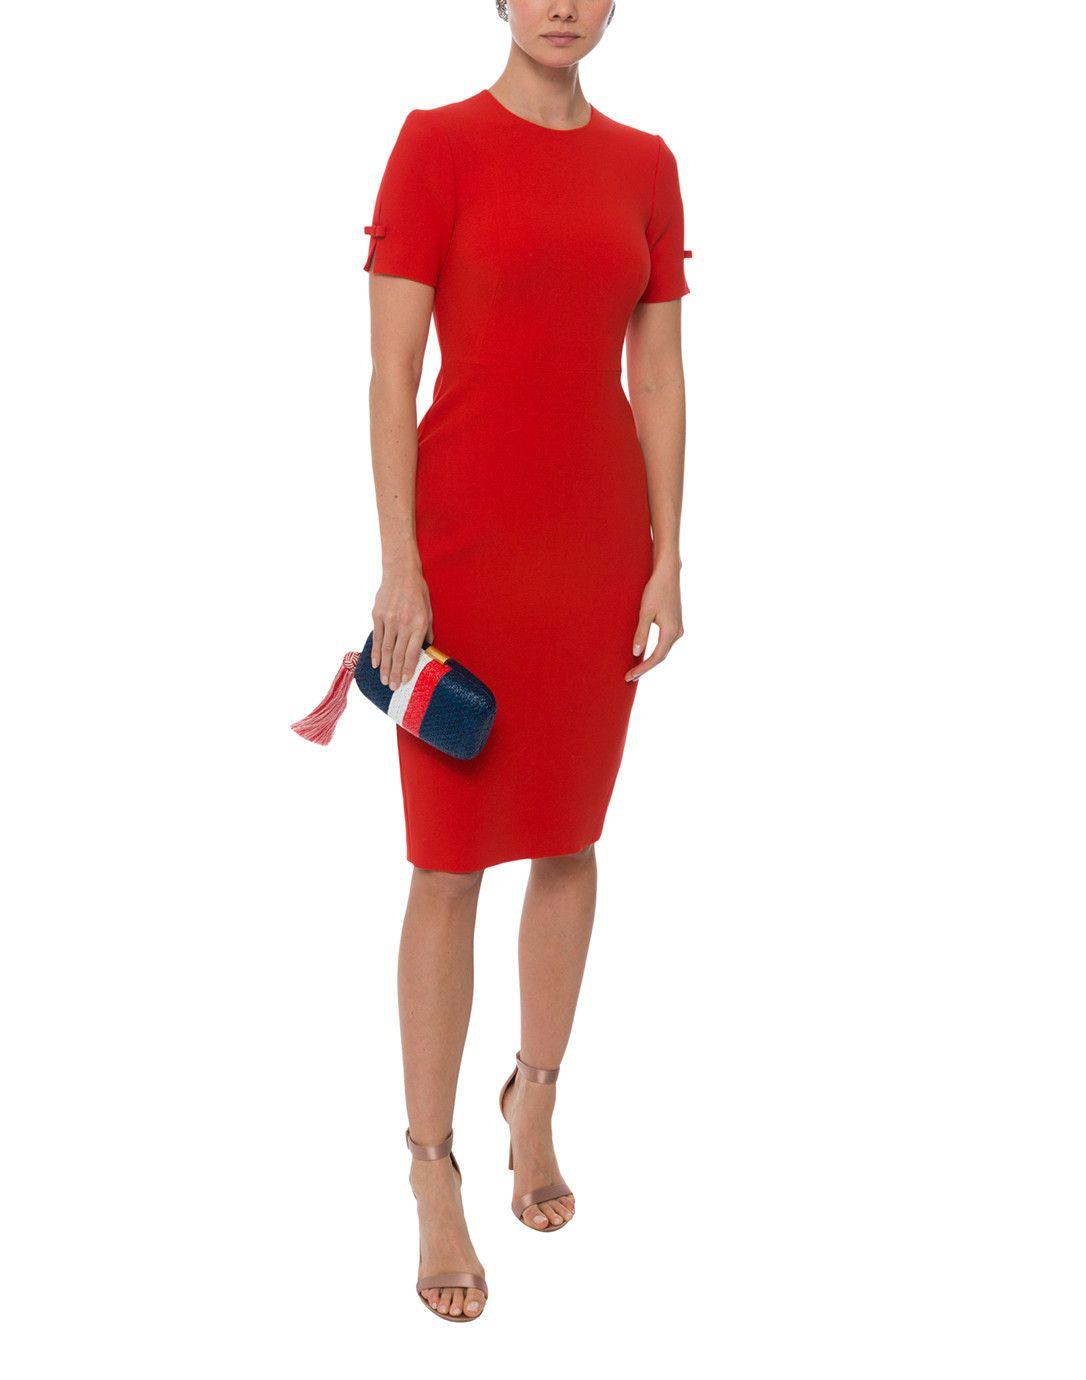 Womens Trinu Dress L.k. Bennett Cheap Sale Low Price Fee Shipping Clearance Cheapest Buy Cheap 100% Original Get Authentic Cheap Online 22jfdk7nCc